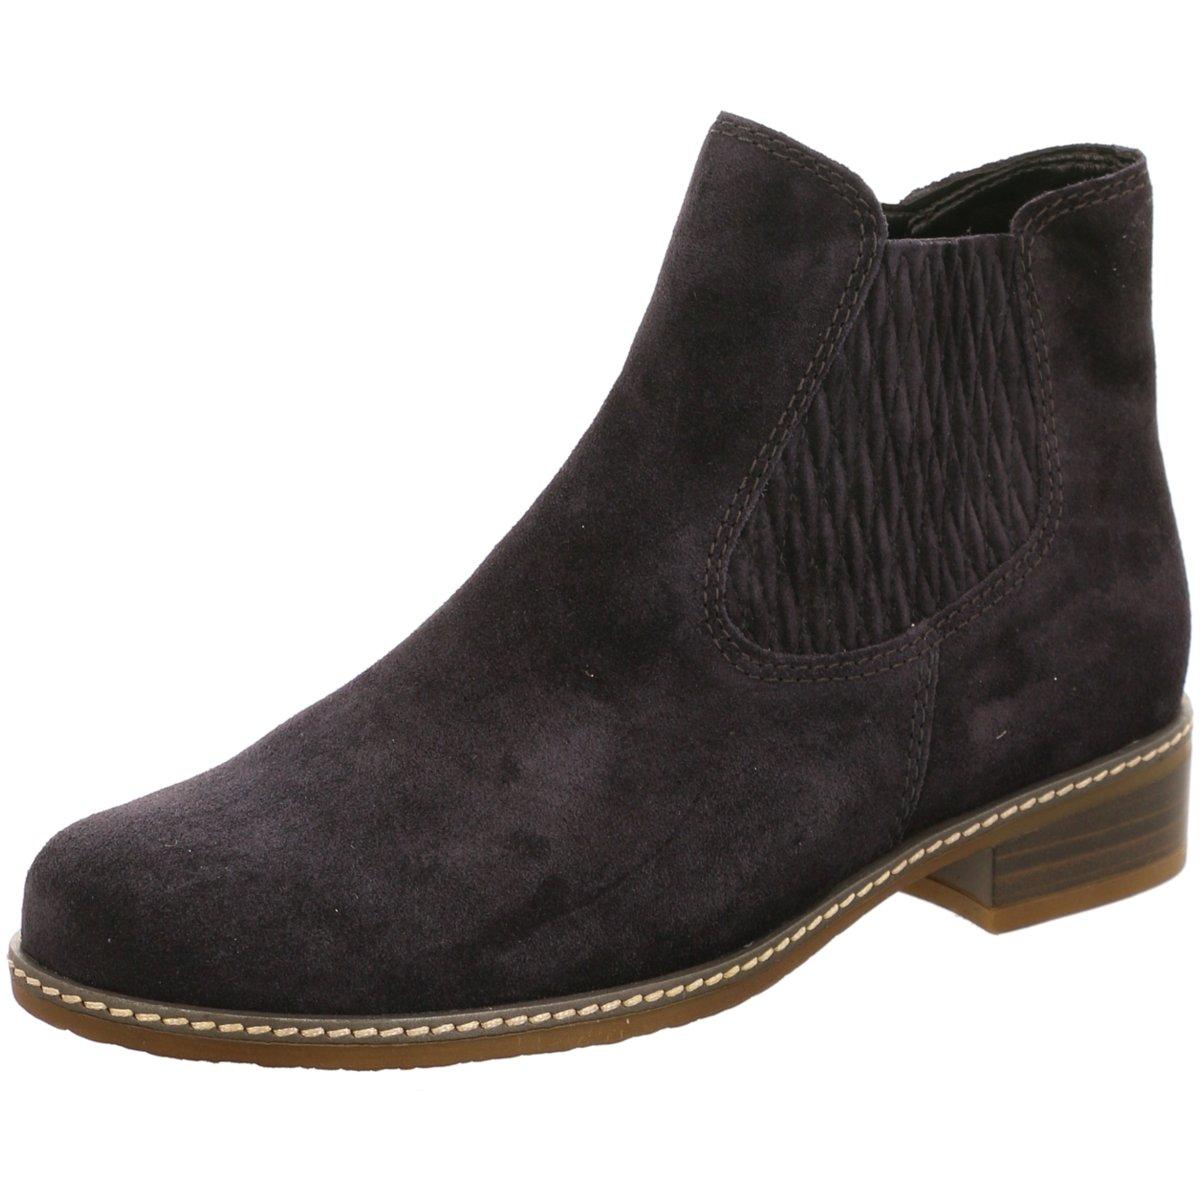 Manitu 961565 Schuhe Damen Stiefeletten Ankle Boots